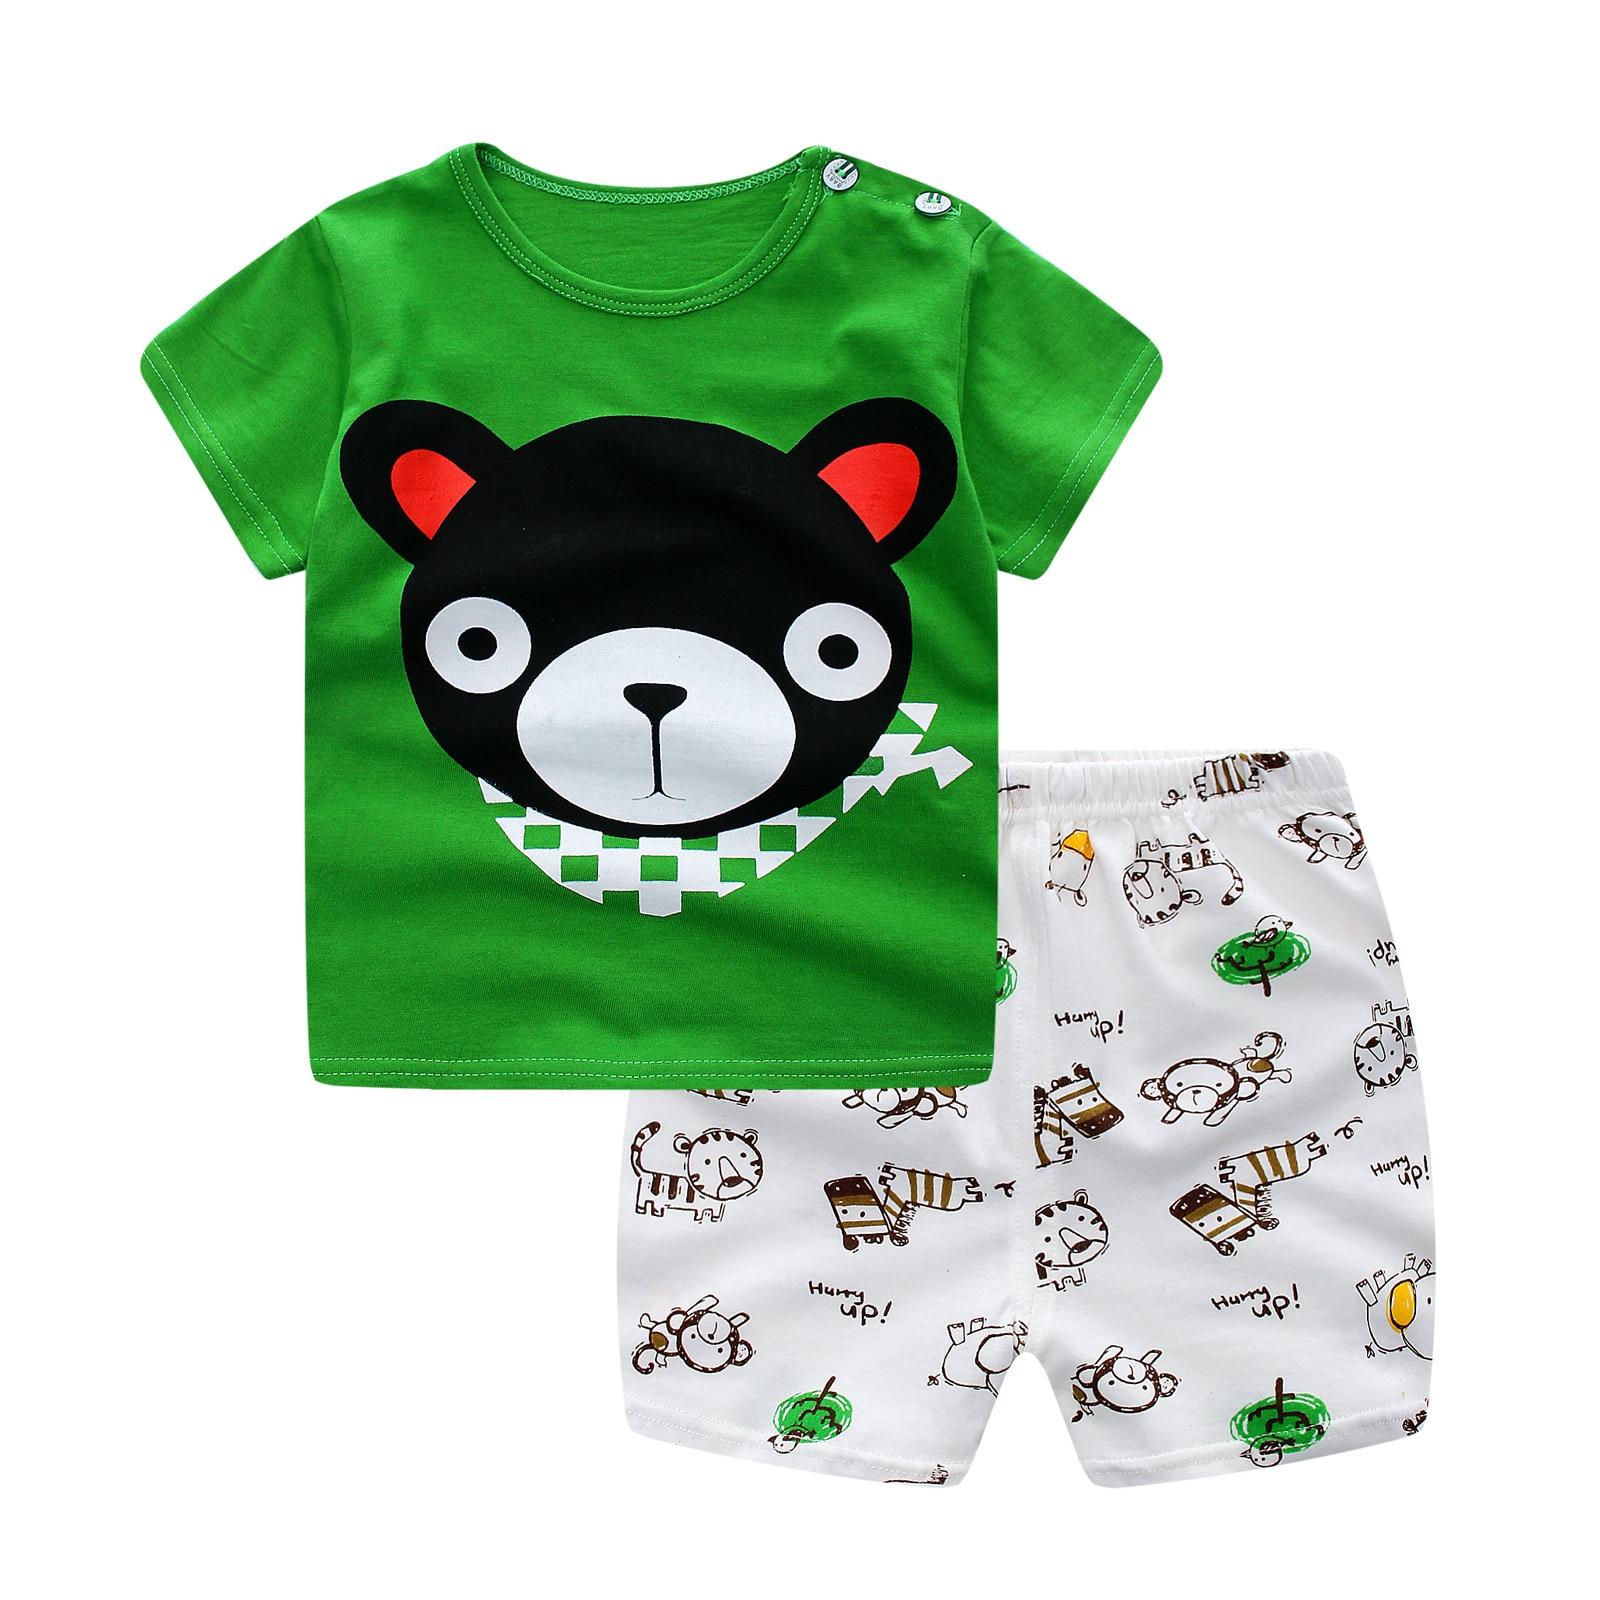 2017 Baru Musim Panas Bayi Laki laki Pakaian Kartun Beruang Anak Anak Perempuan Balita Pakaian Set Lengan Pendek T Shirt Striped celana di Set pakaian